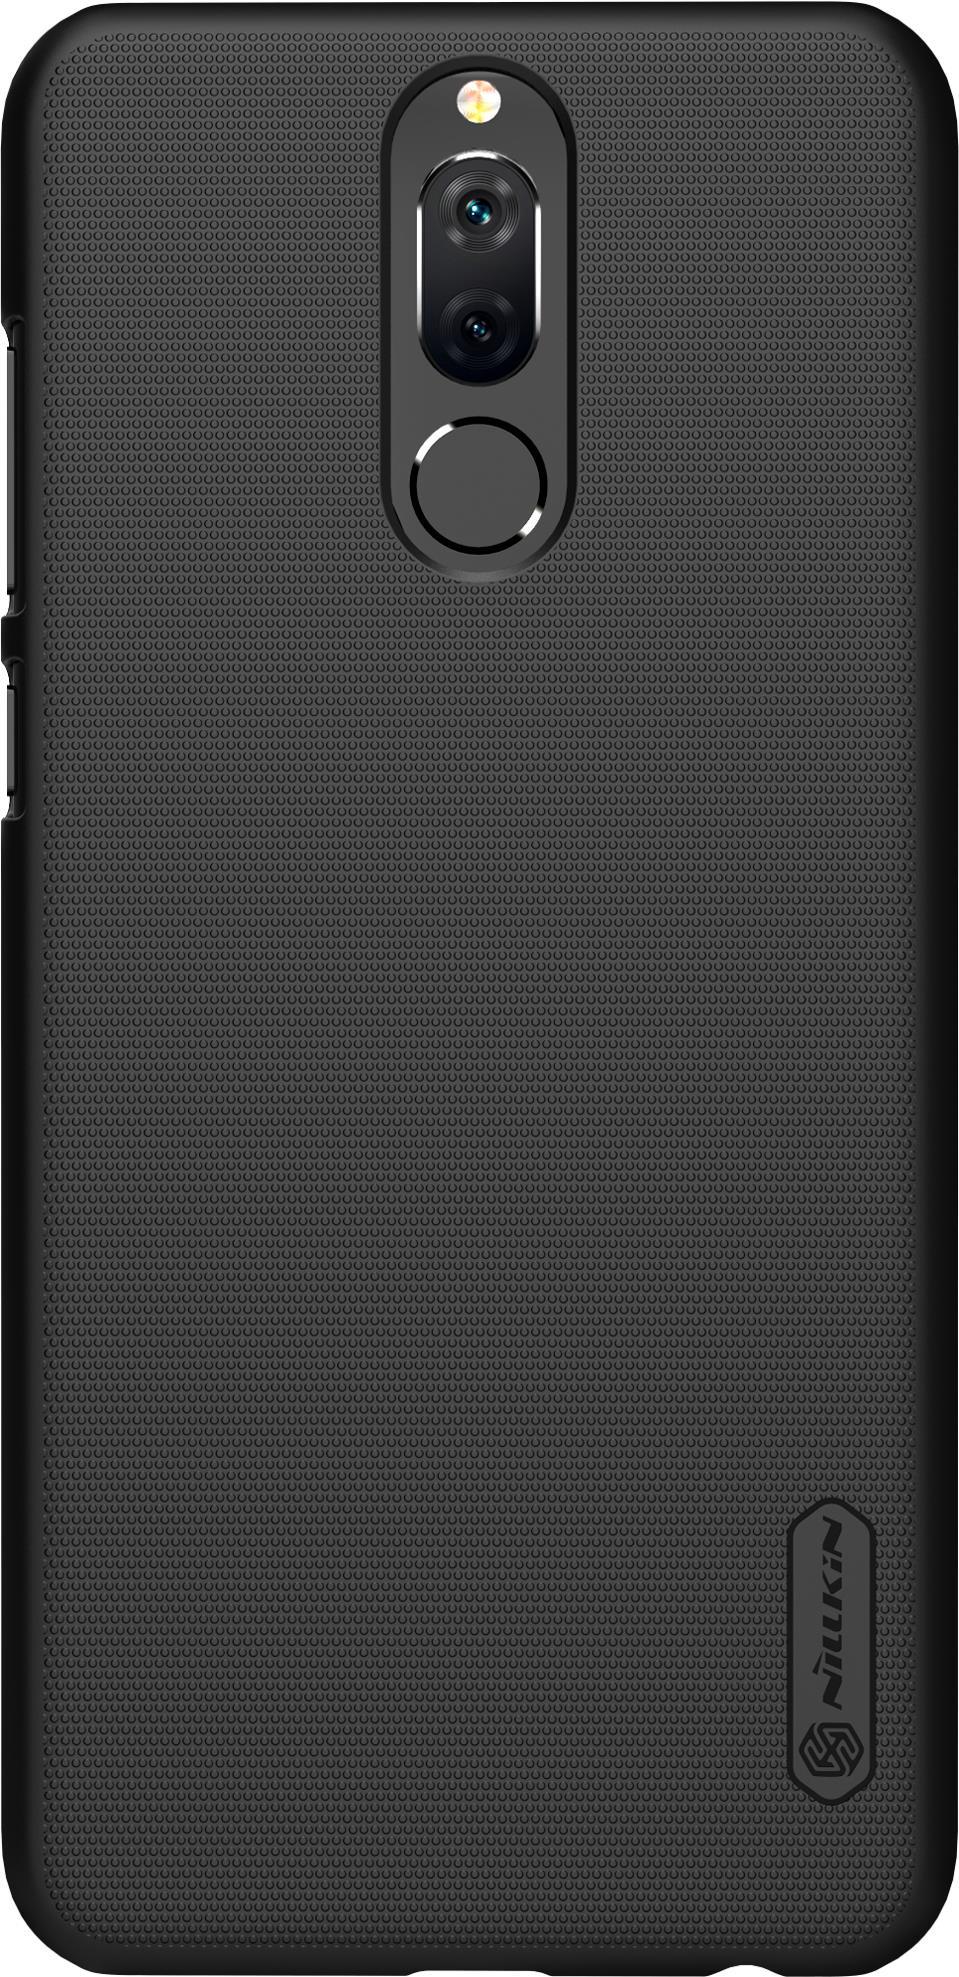 Чехол для сотового телефона Nillkin T-N-HN2I-002, черный накладка nillkin super frosted shield для iphone 6 plus цвет белый t n iphone6p 002